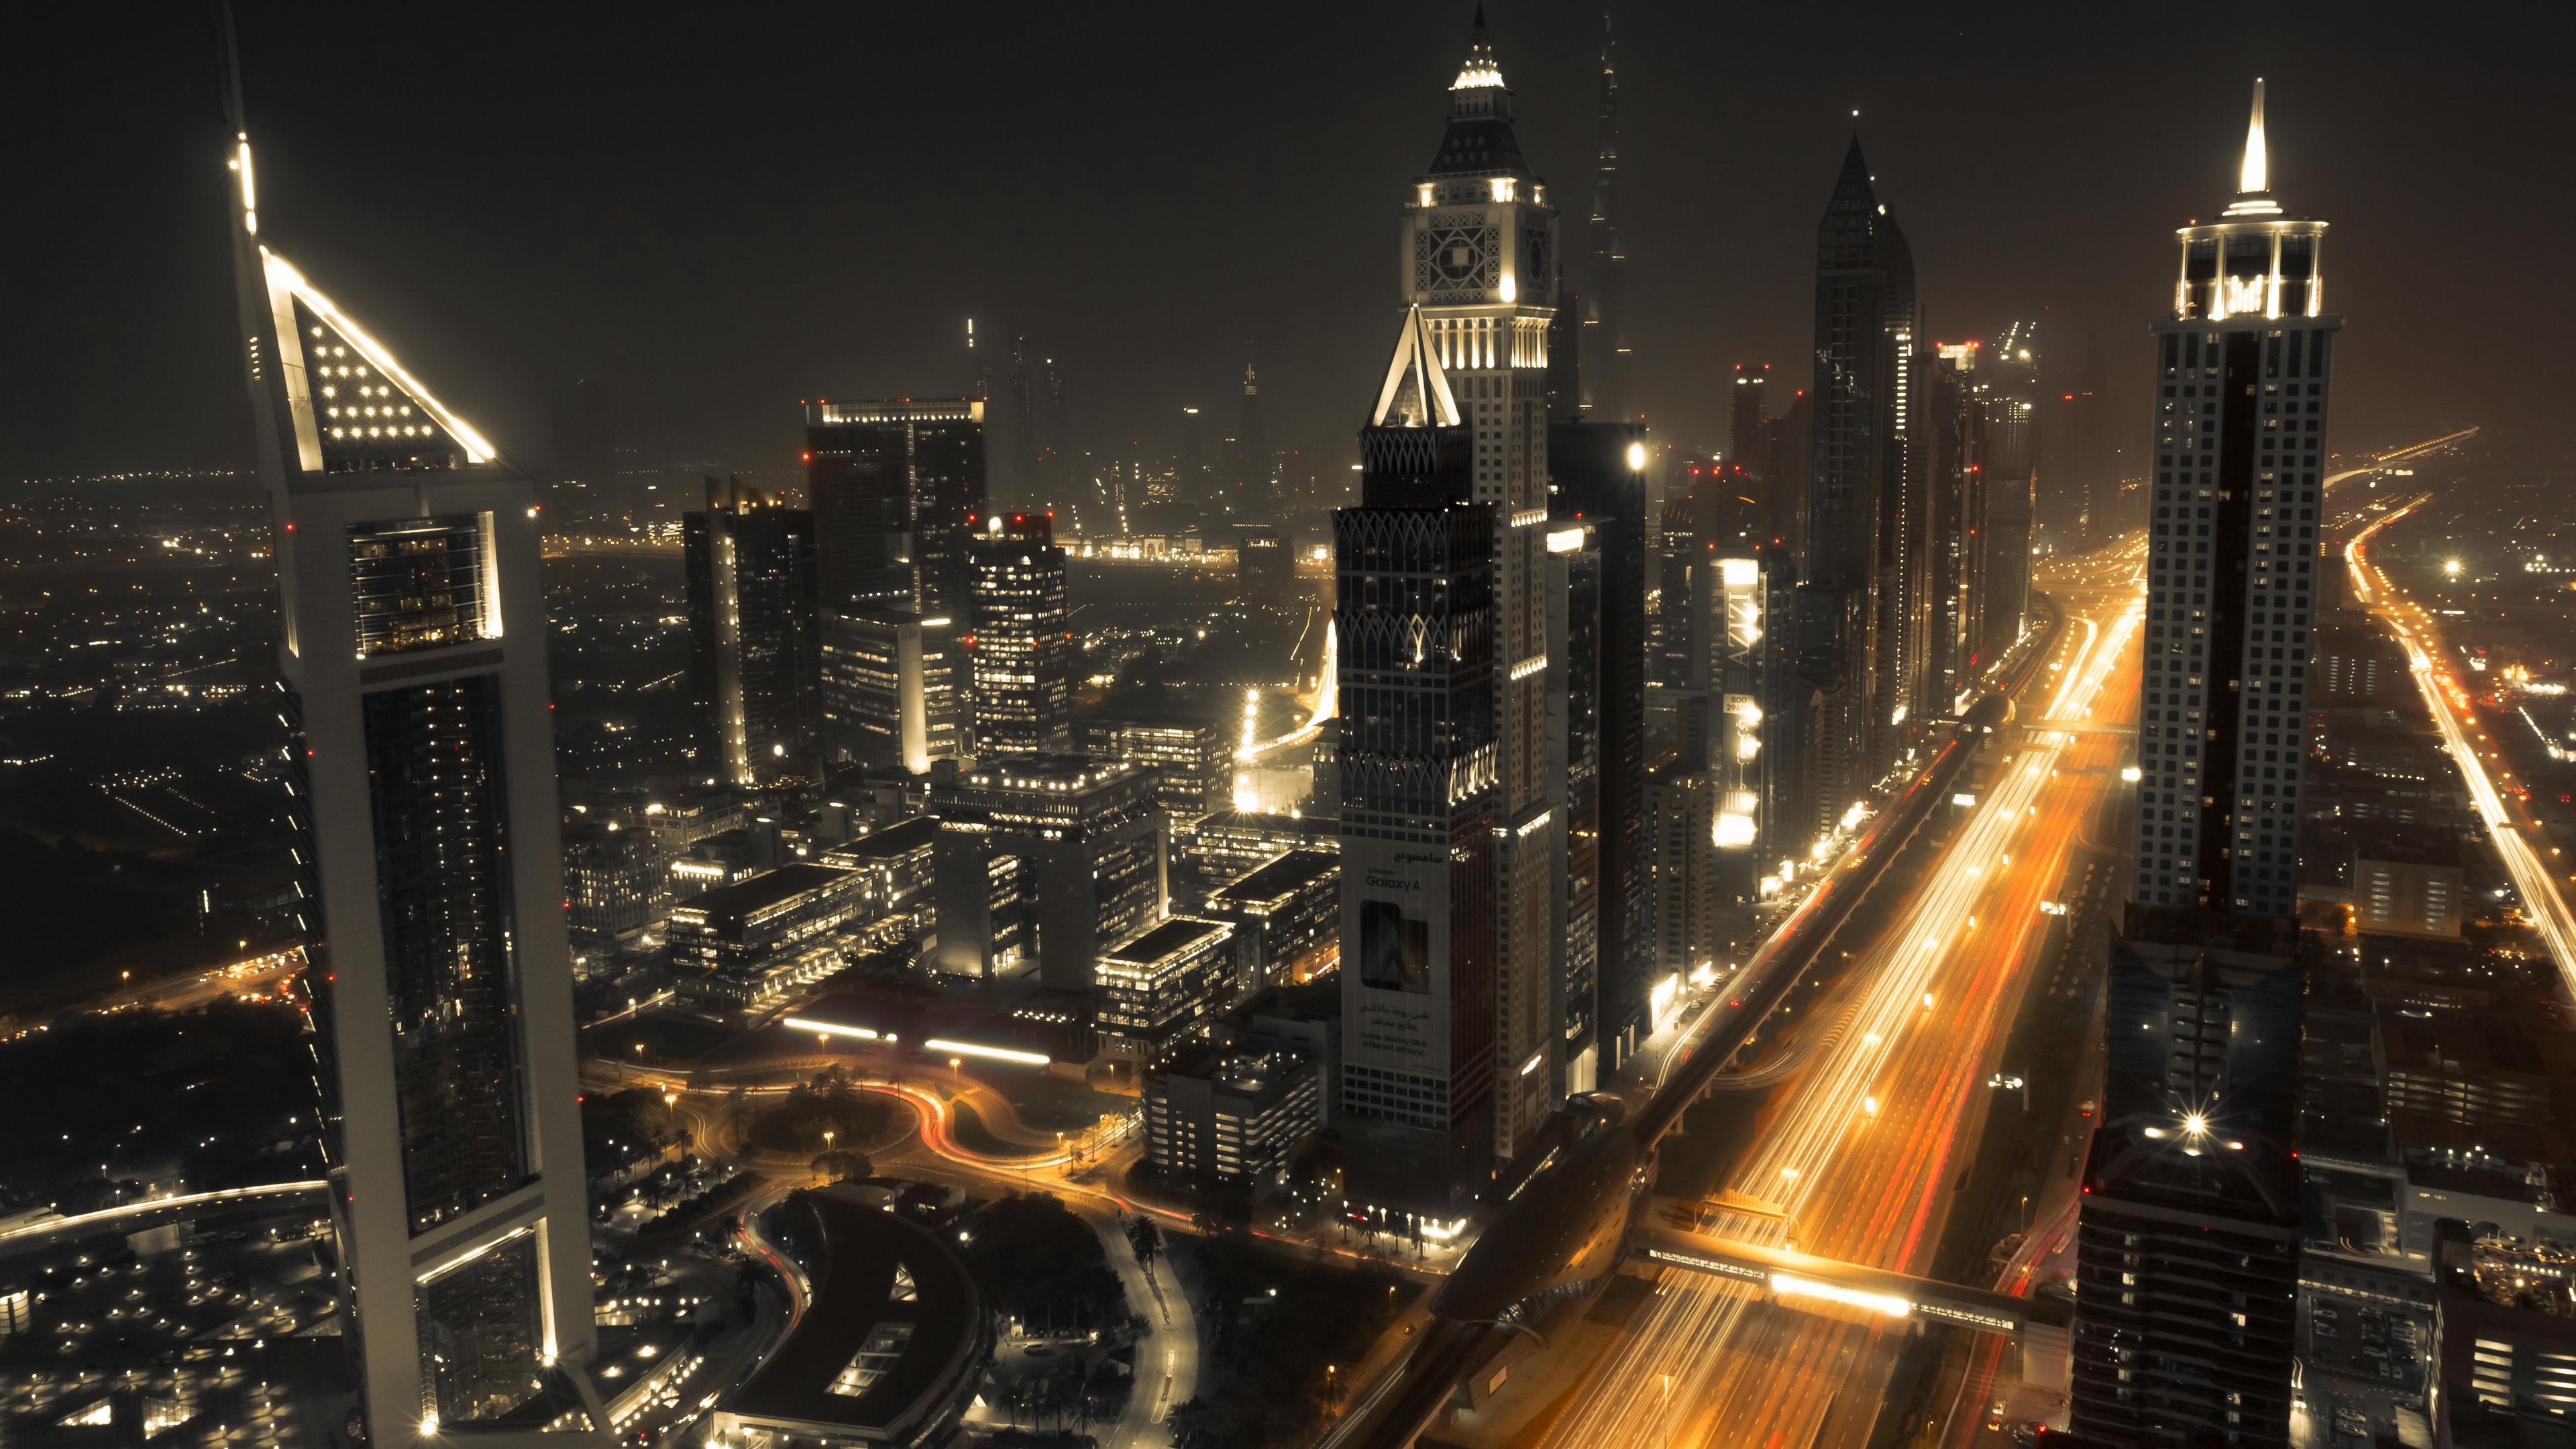 dubai architecture buildings night 4k 1538066417 - dubai, architecture, buildings, night 4k - Dubai, buildings, Architecture